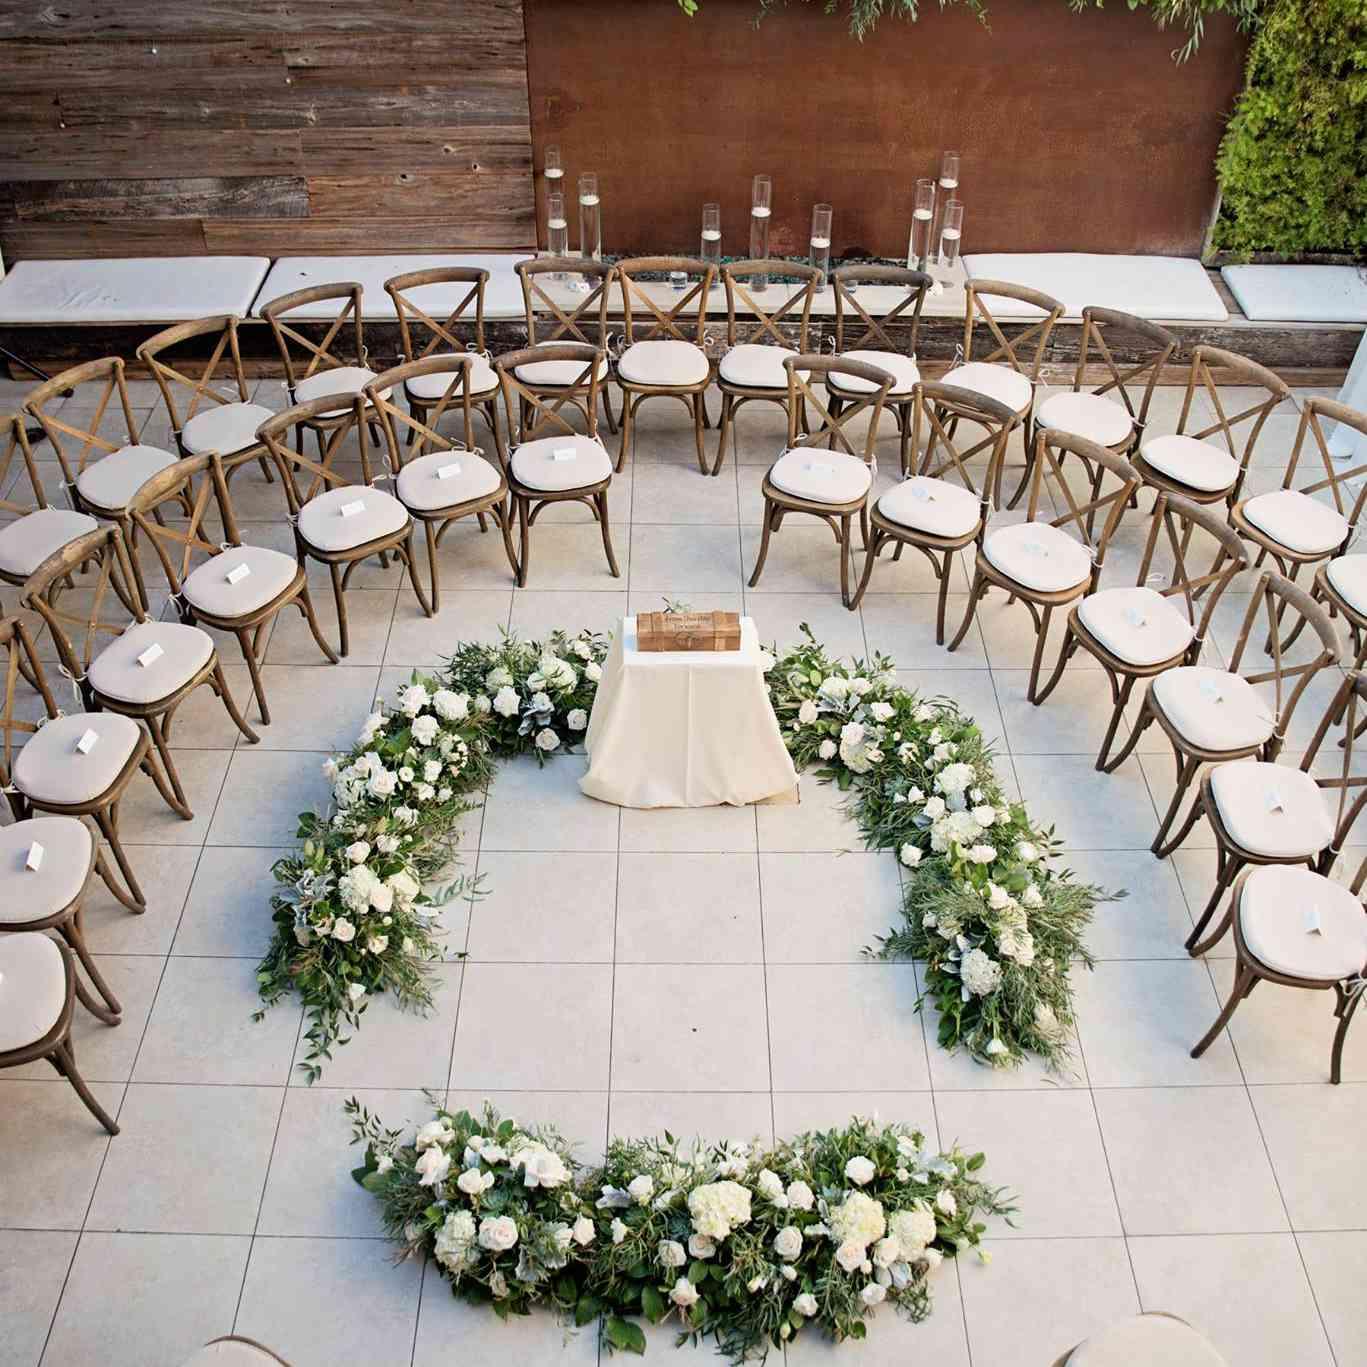 5 Unique Wedding Ceremony Seating Ideas